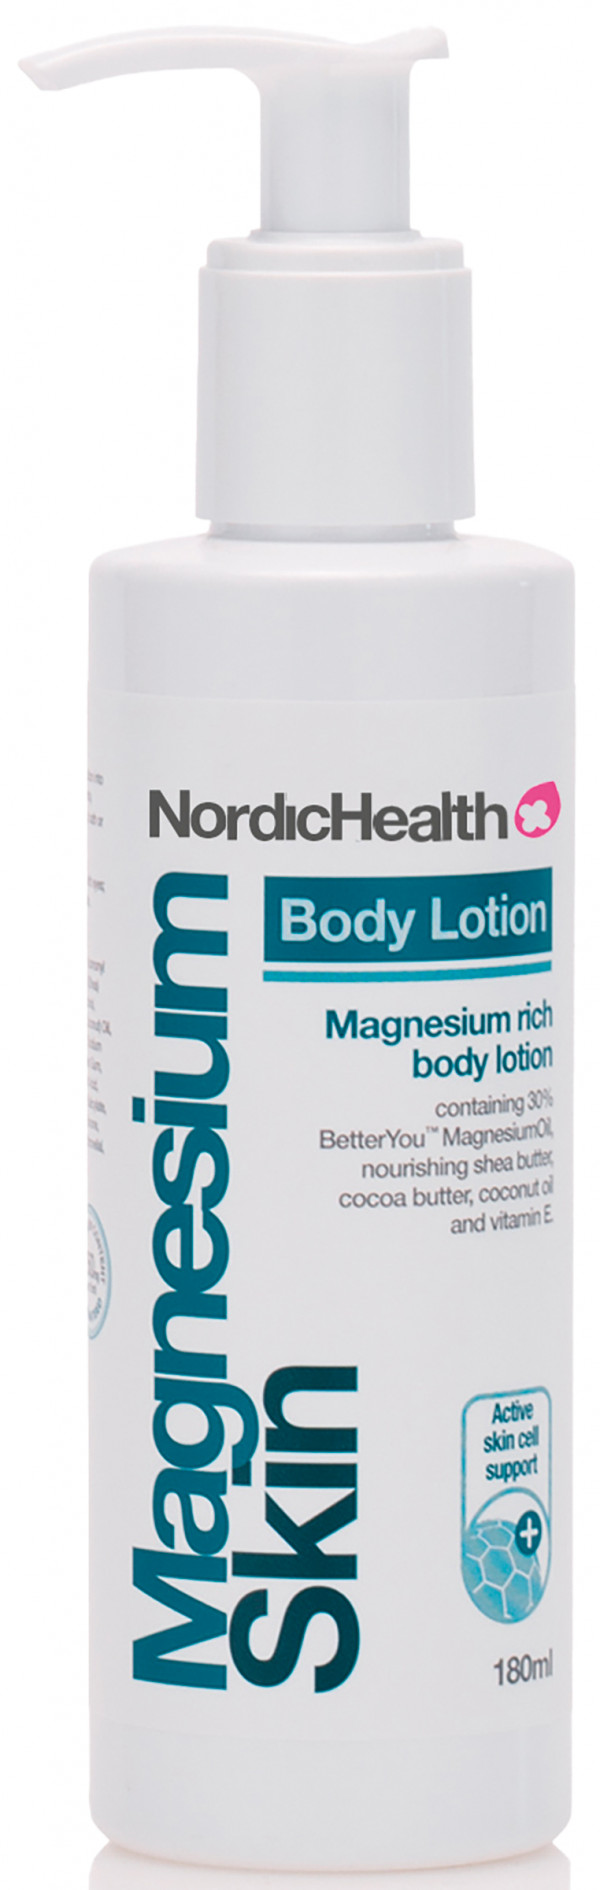 NordicHealth magnesium body lotion 180ml